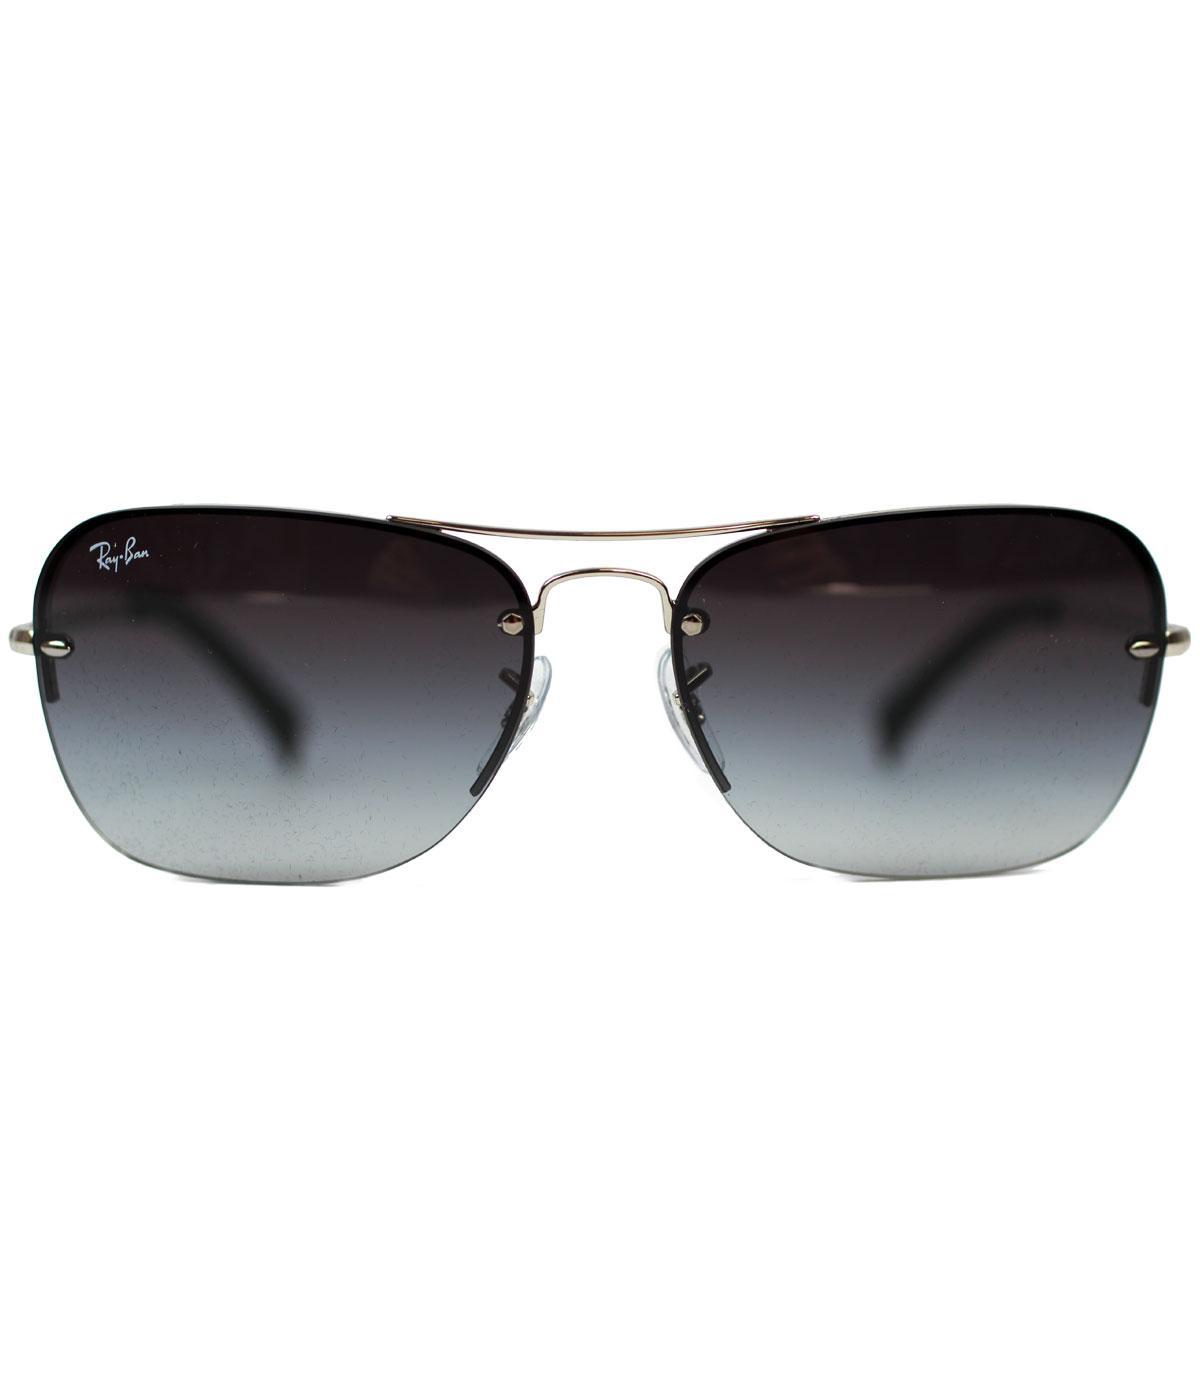 25ea72660e5c Dd6047 Aviator Sunglasses